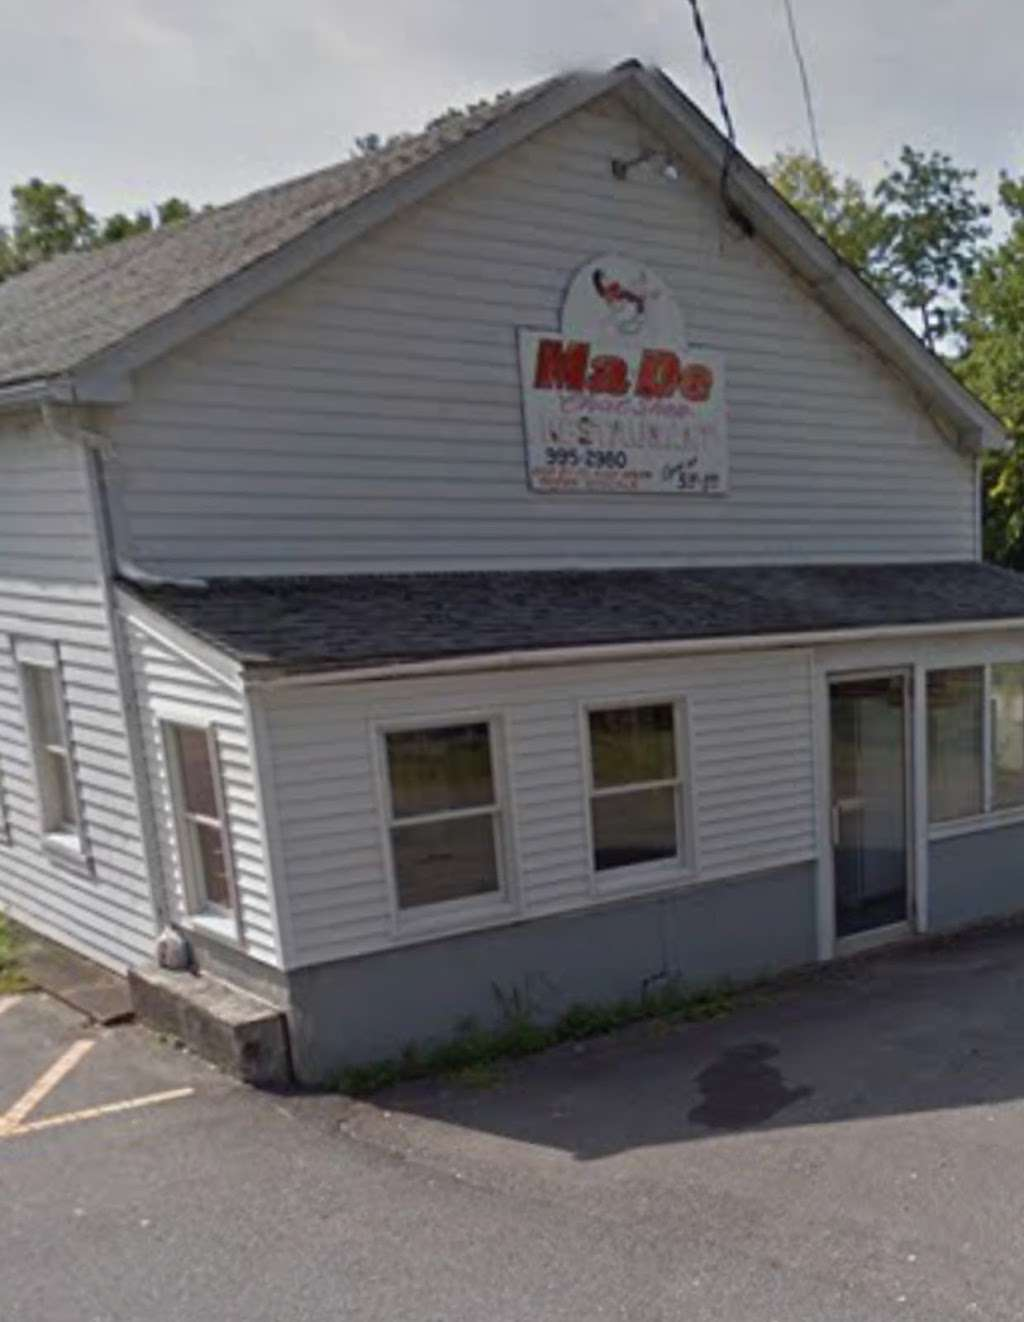 Ma-De-Chat Shop - cafe  | Photo 10 of 10 | Address: 8 Railroad Ave, Milford, NJ 08848, USA | Phone: (908) 995-2980